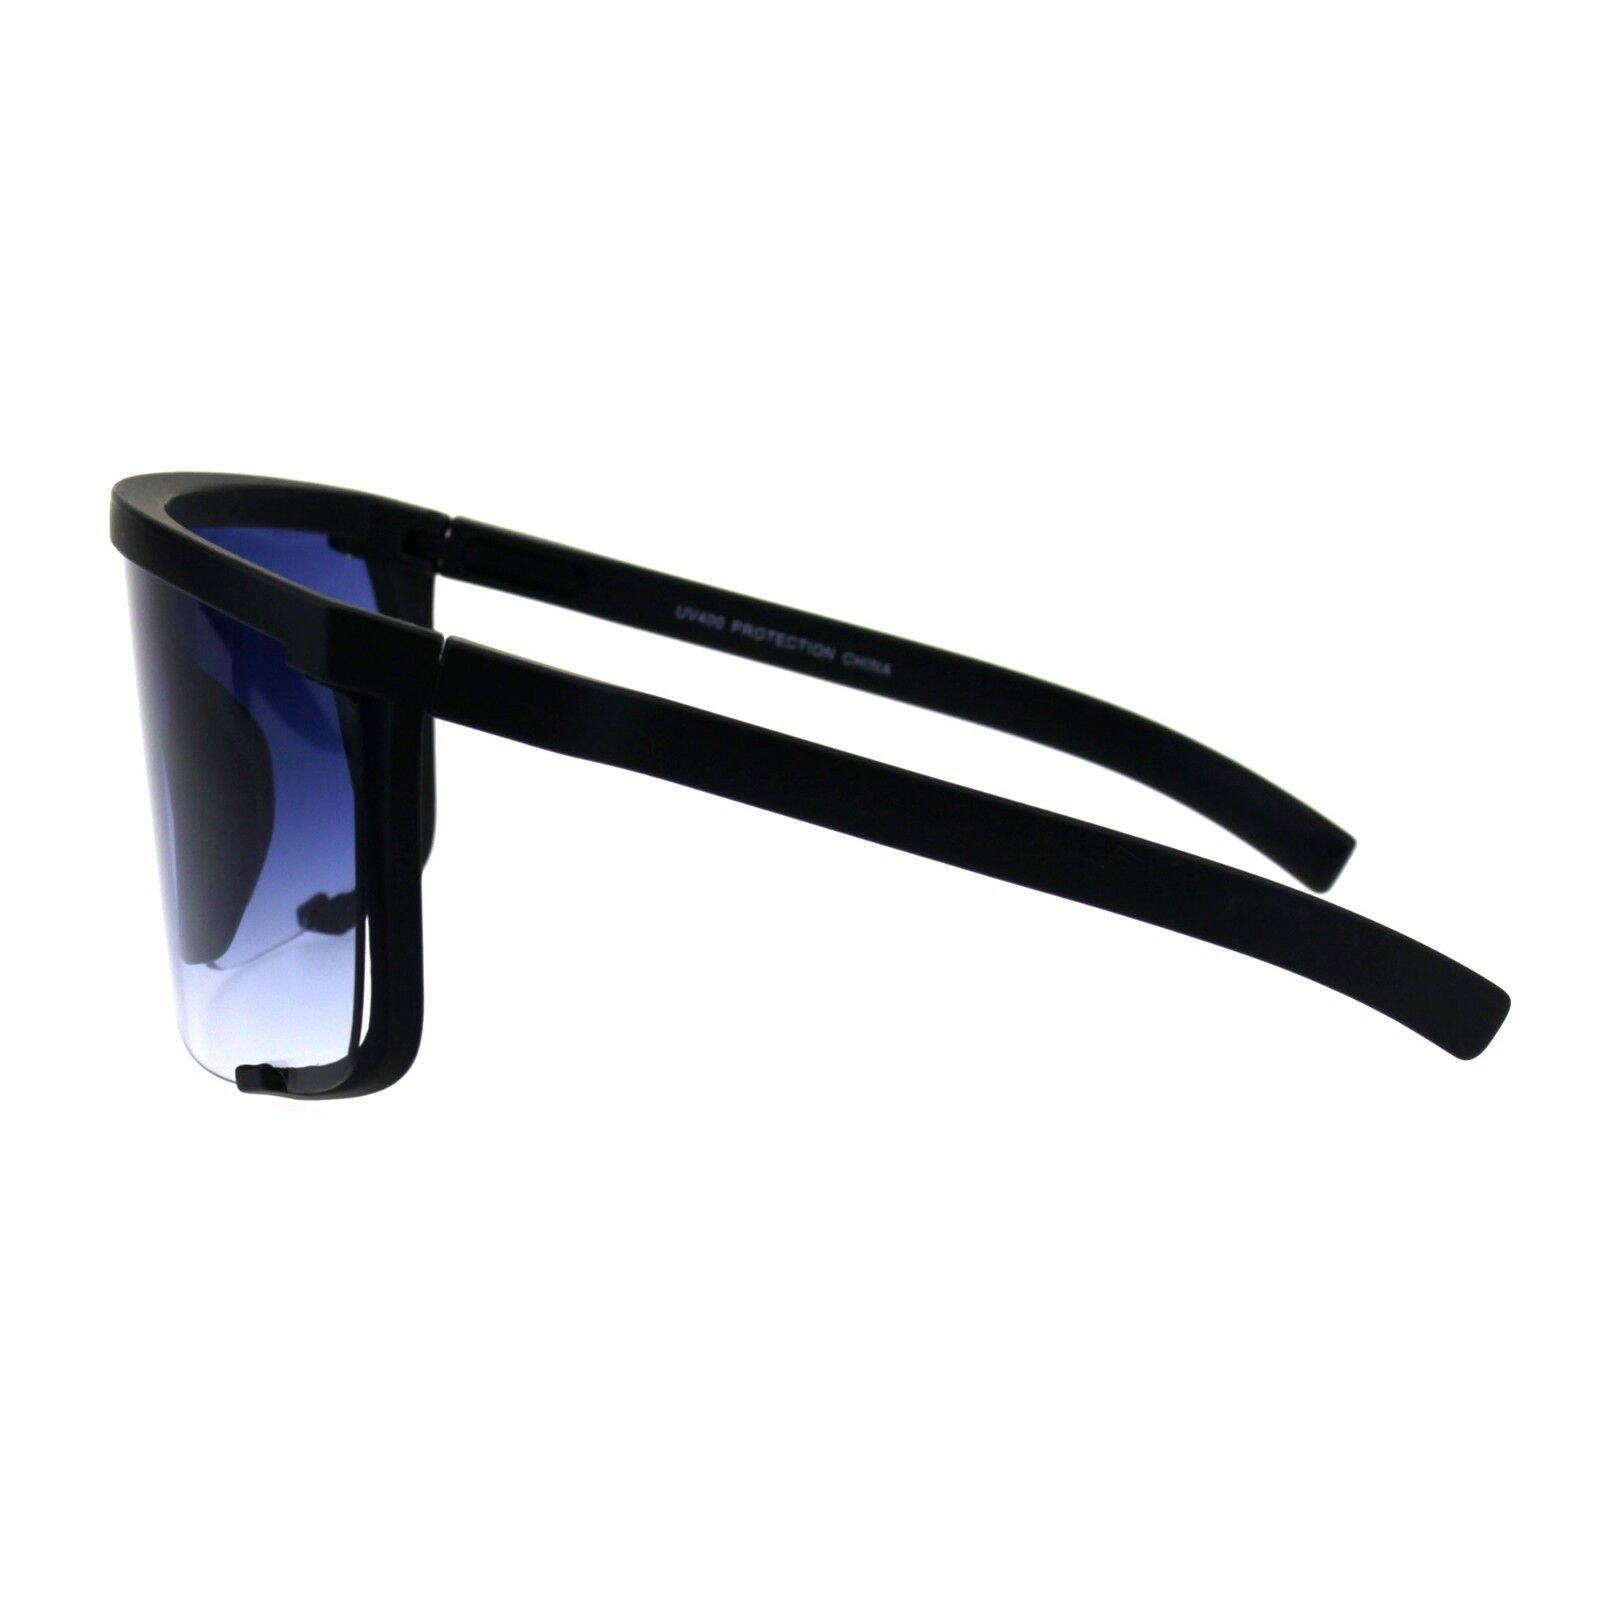 Super Oversized Goggle Sunglasses Unisex Fashion Square Frame UV 400